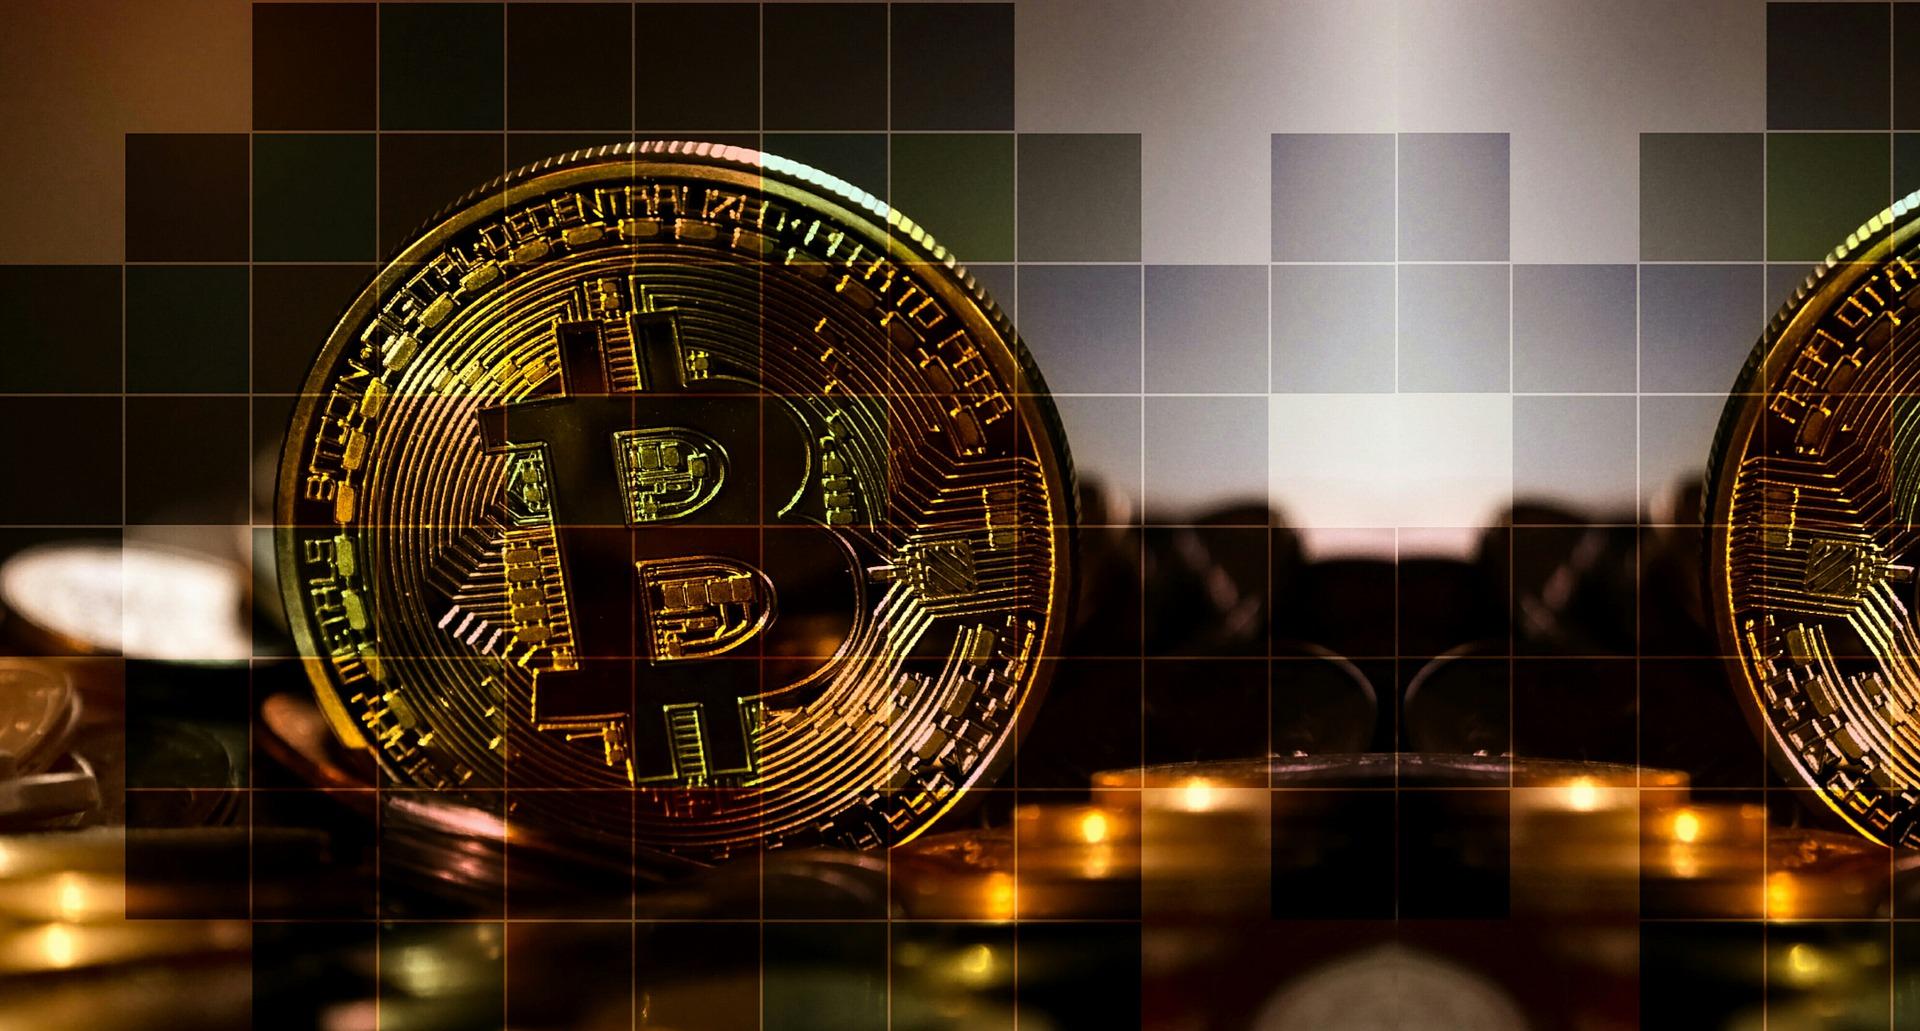 stato bitcoin 2021 bitcoin banche amichevoli uk